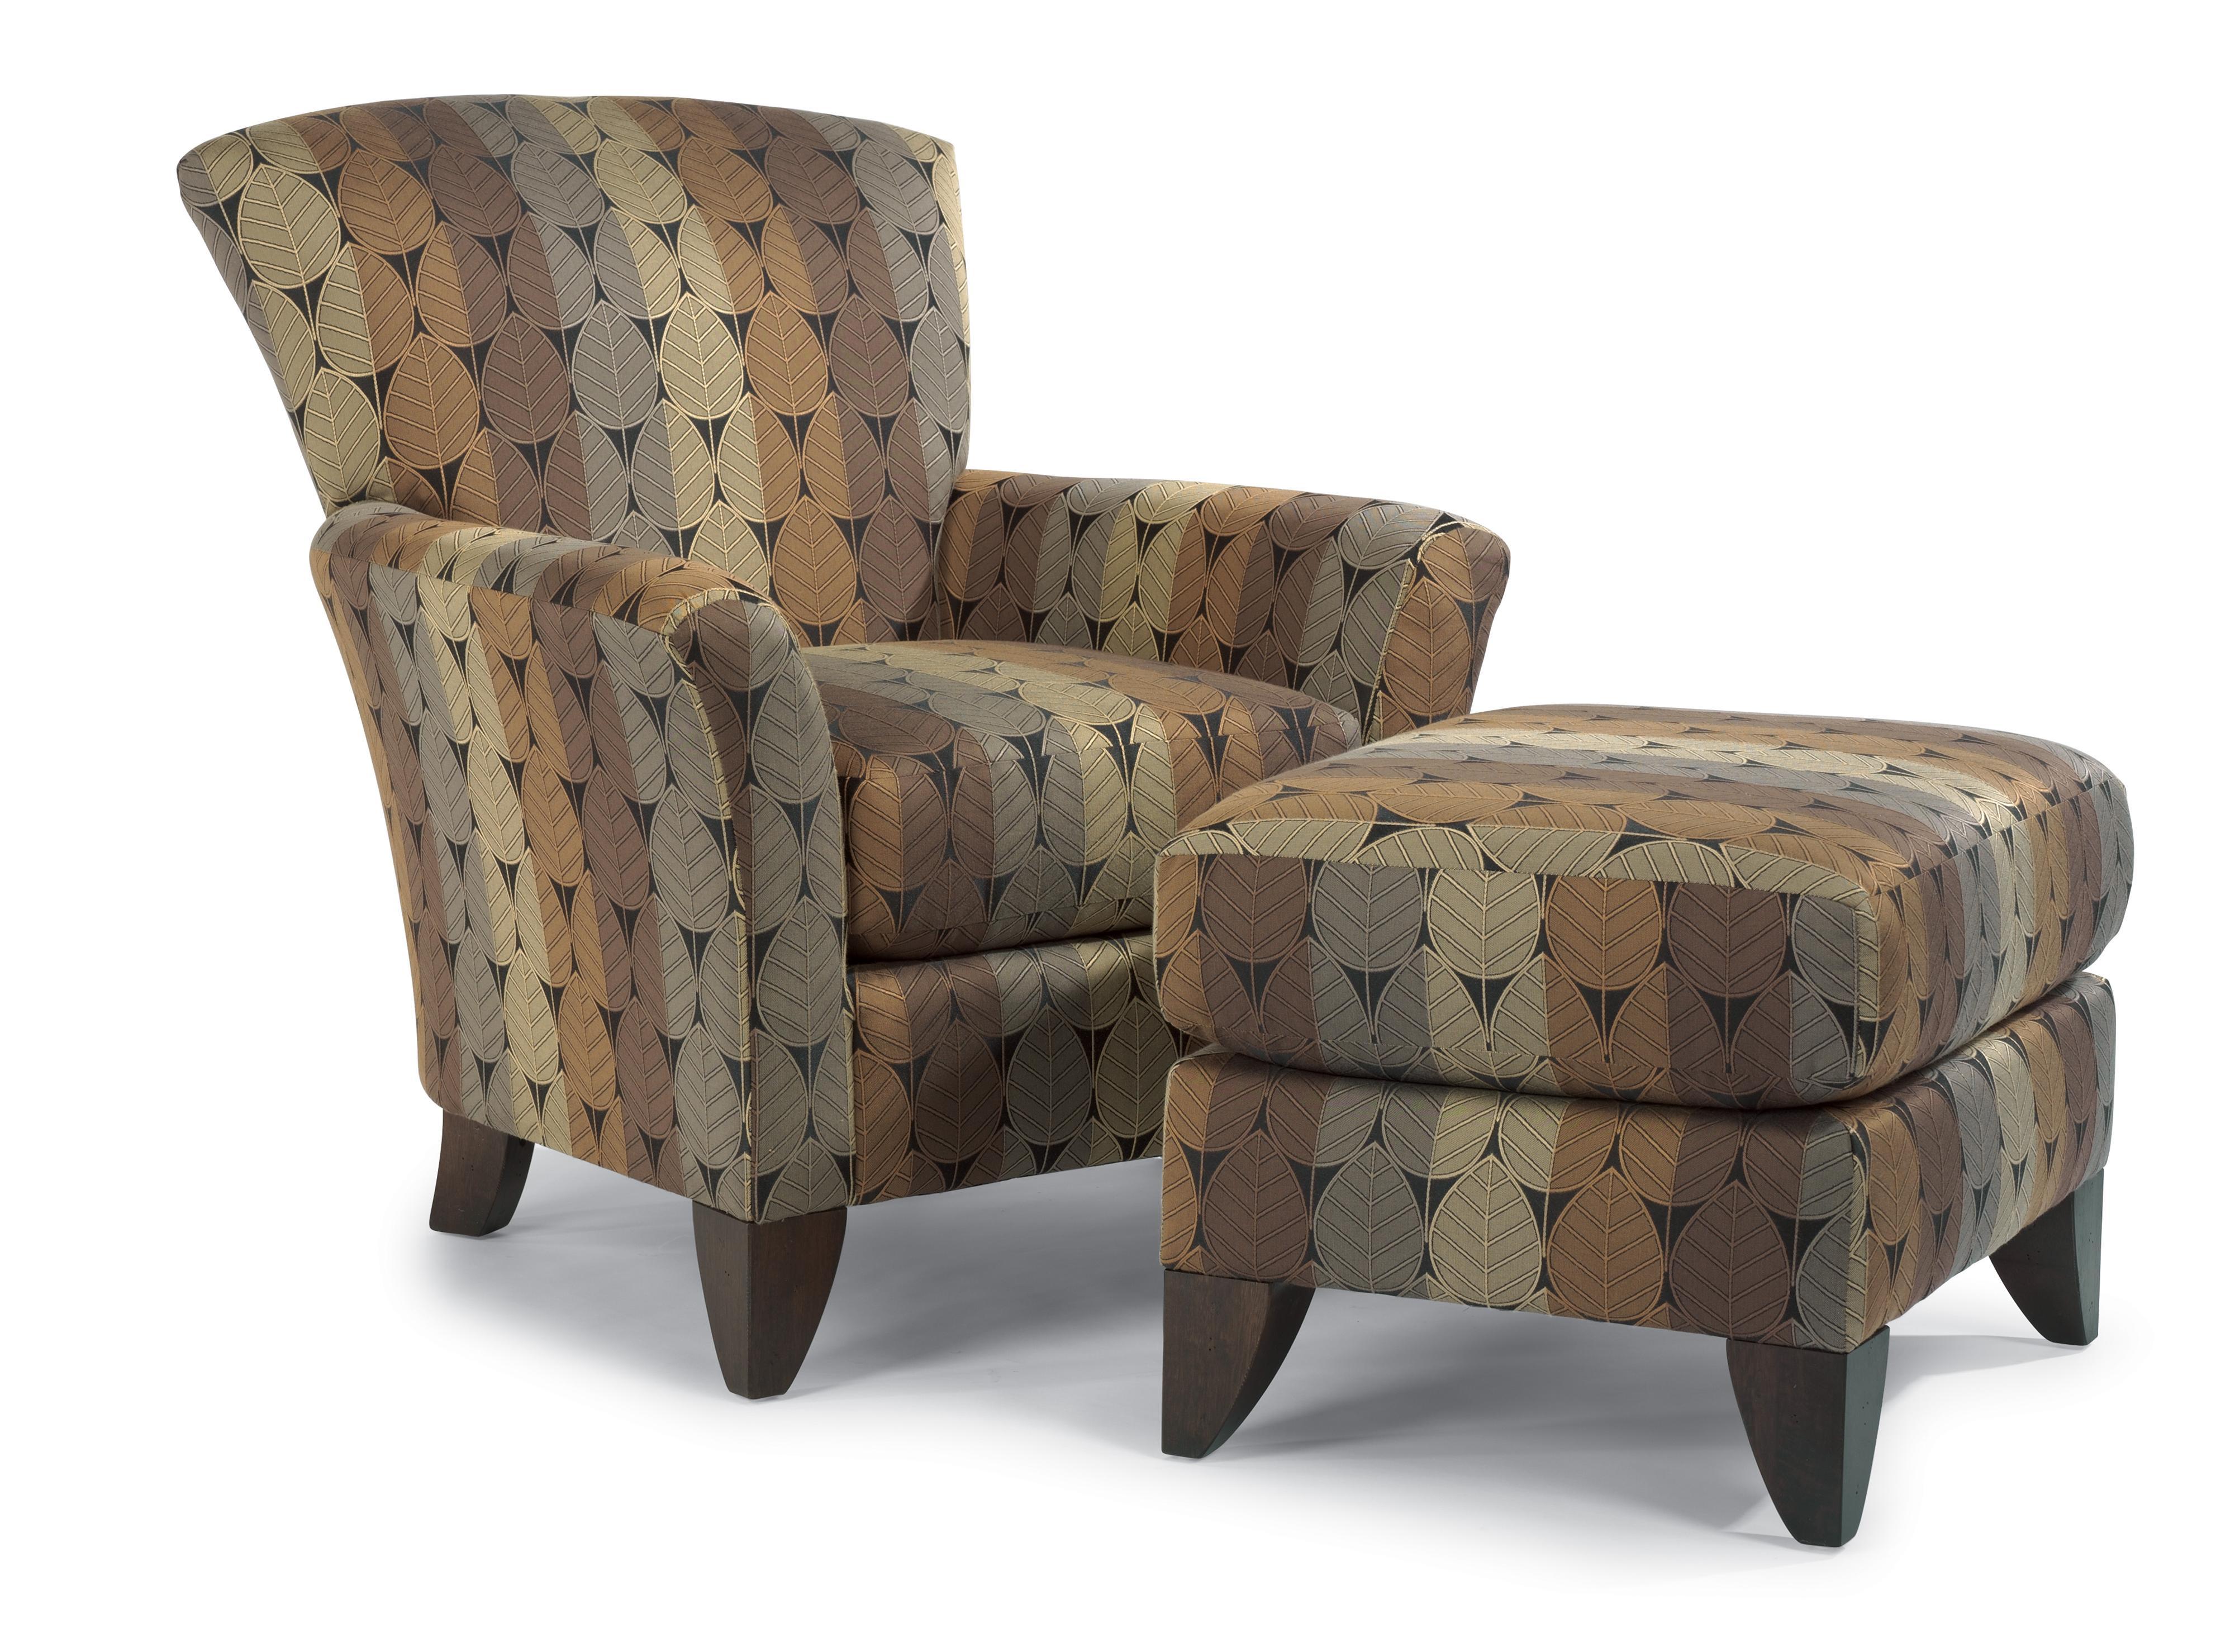 chairs and ottomans upholstered wooden church uk flexsteel accents jupiter ottoman belfort